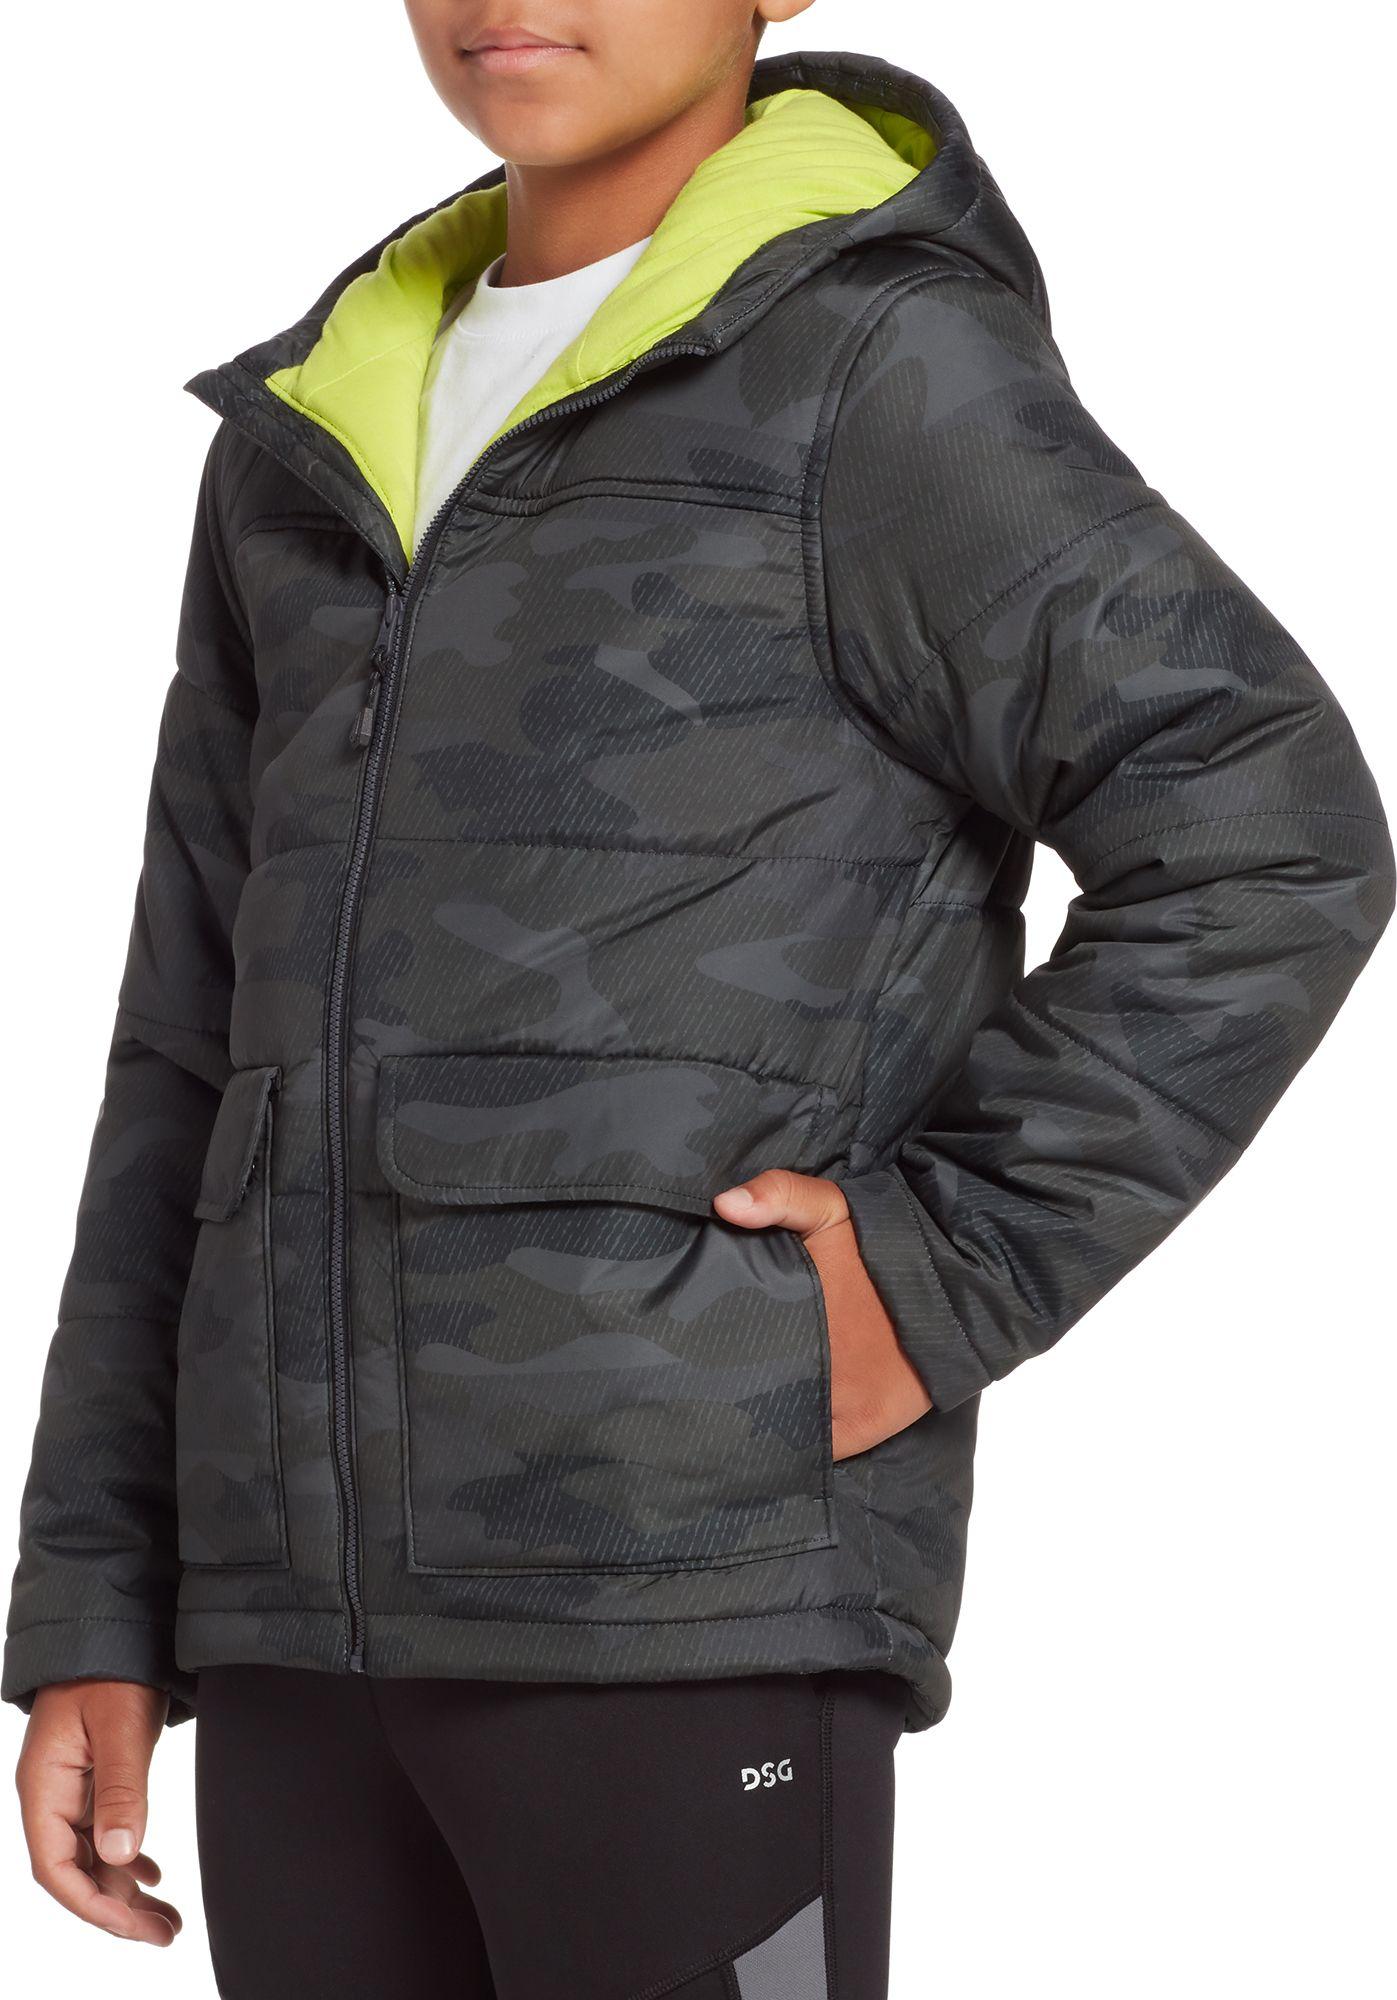 DSG Boys' Printed Insulated Jacket, XXS, Asphalt Twill Camo